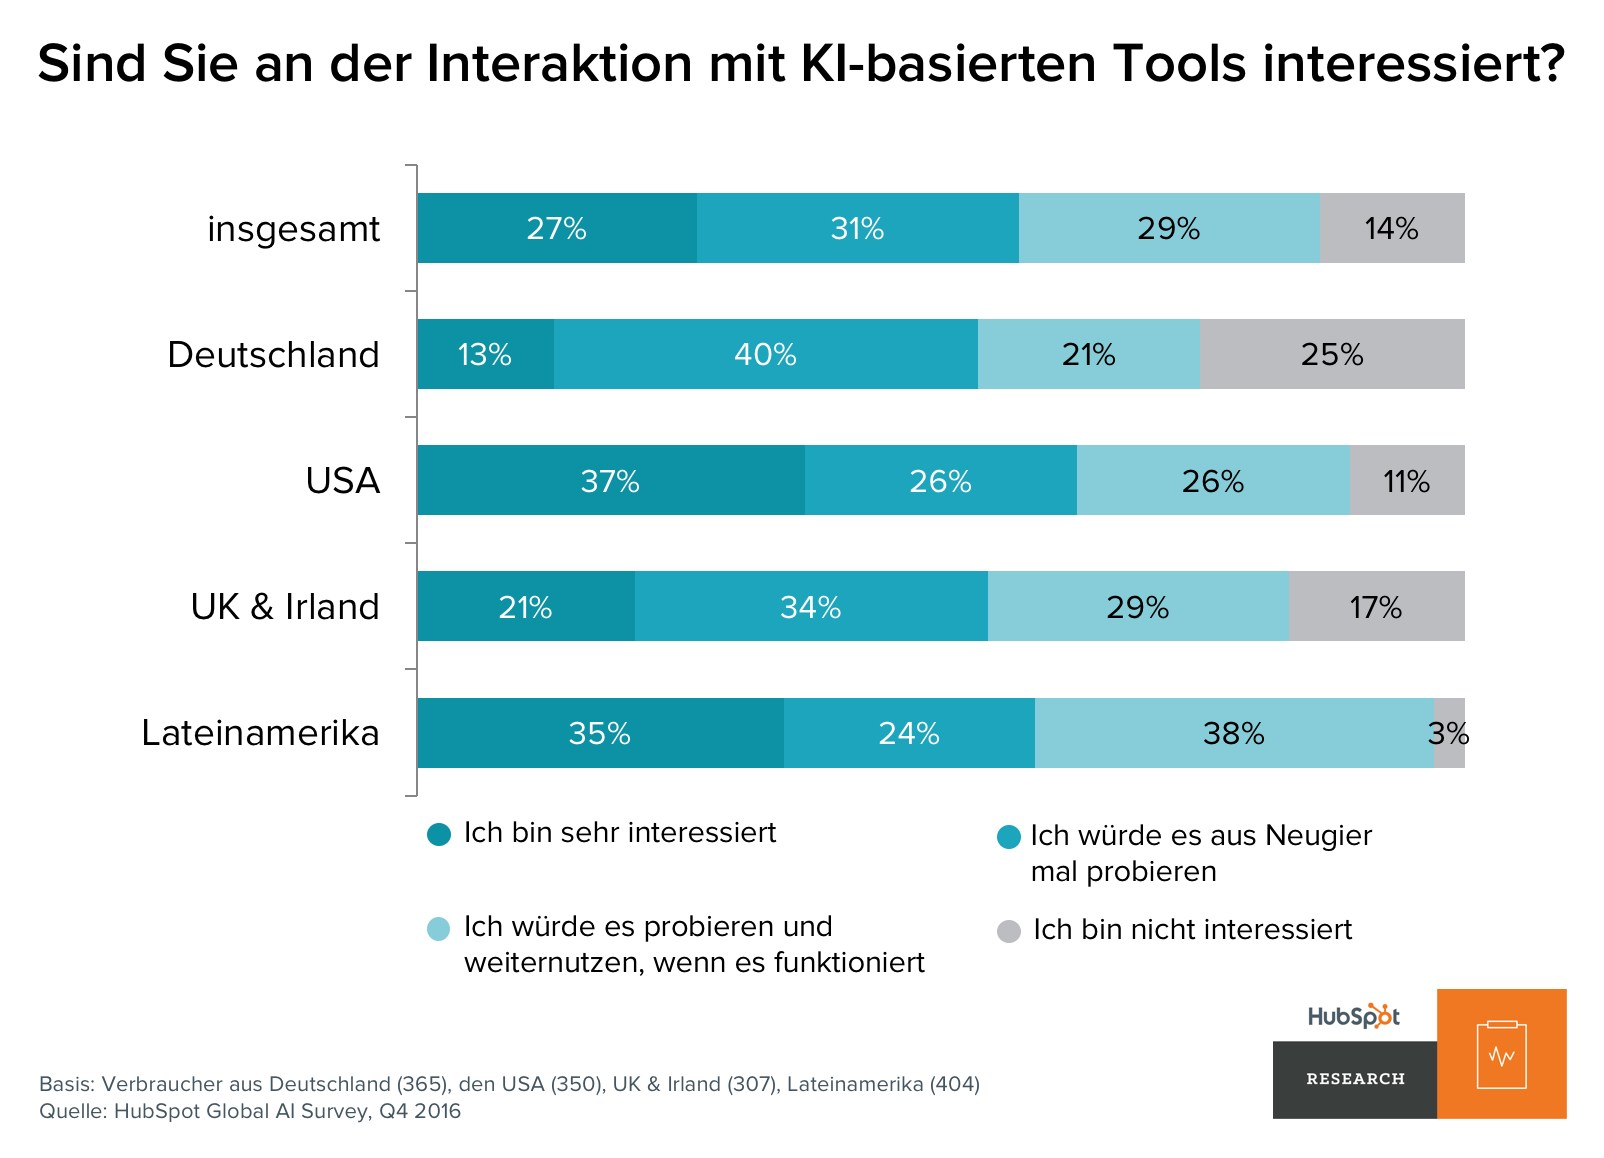 grafik hubspot ki-basierte tools interesse